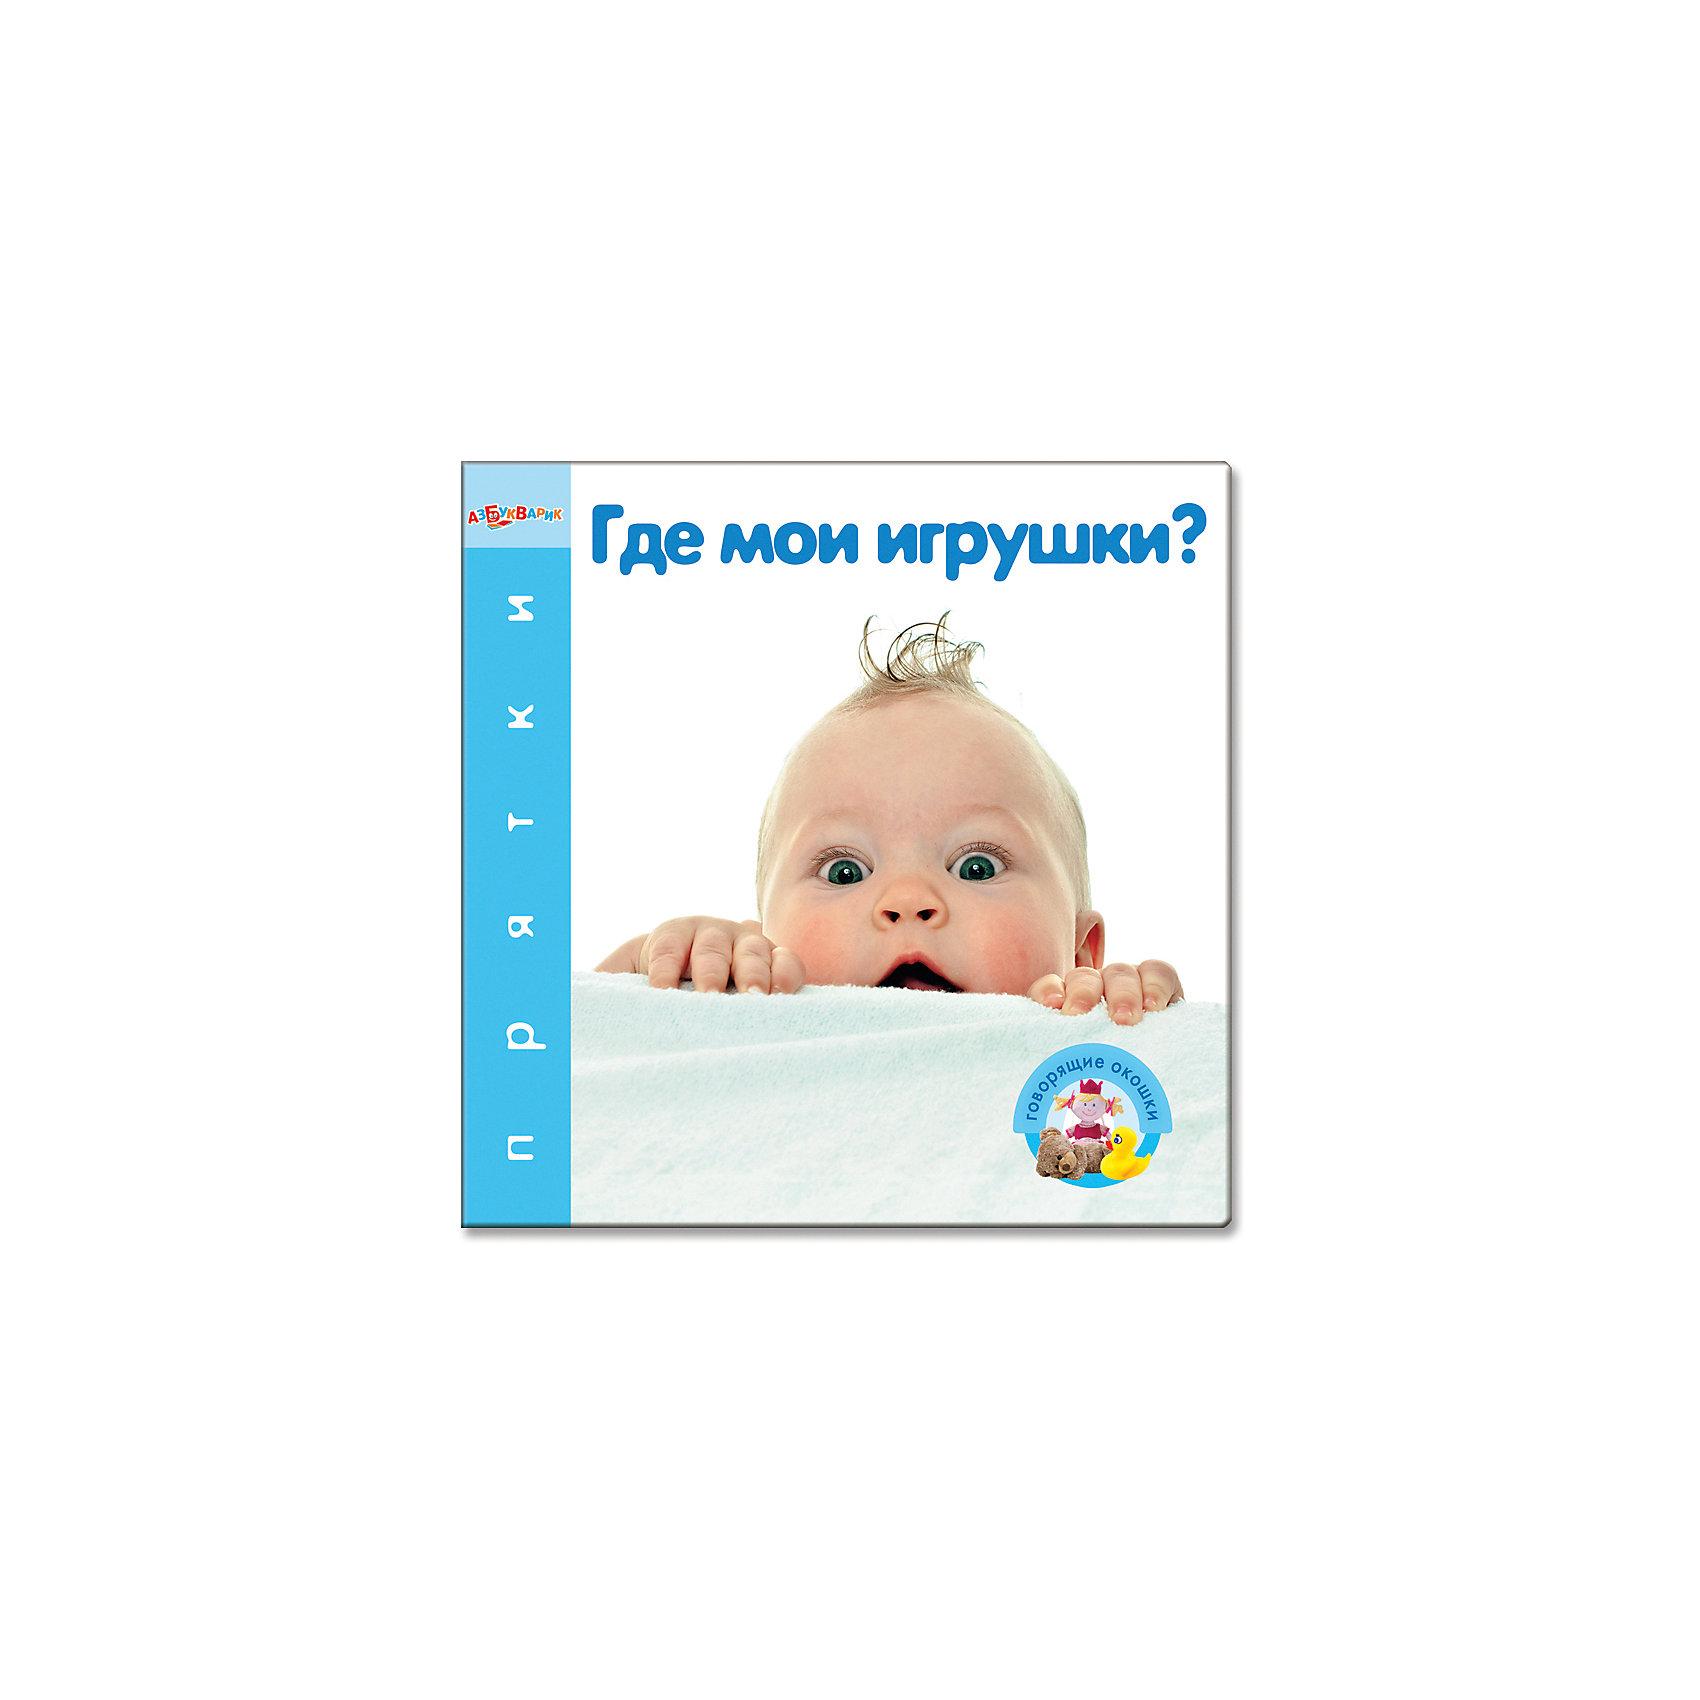 Азбукварик Книга с говорящими окошками Где мои игрушки? где игрушки повтарюшки в москве